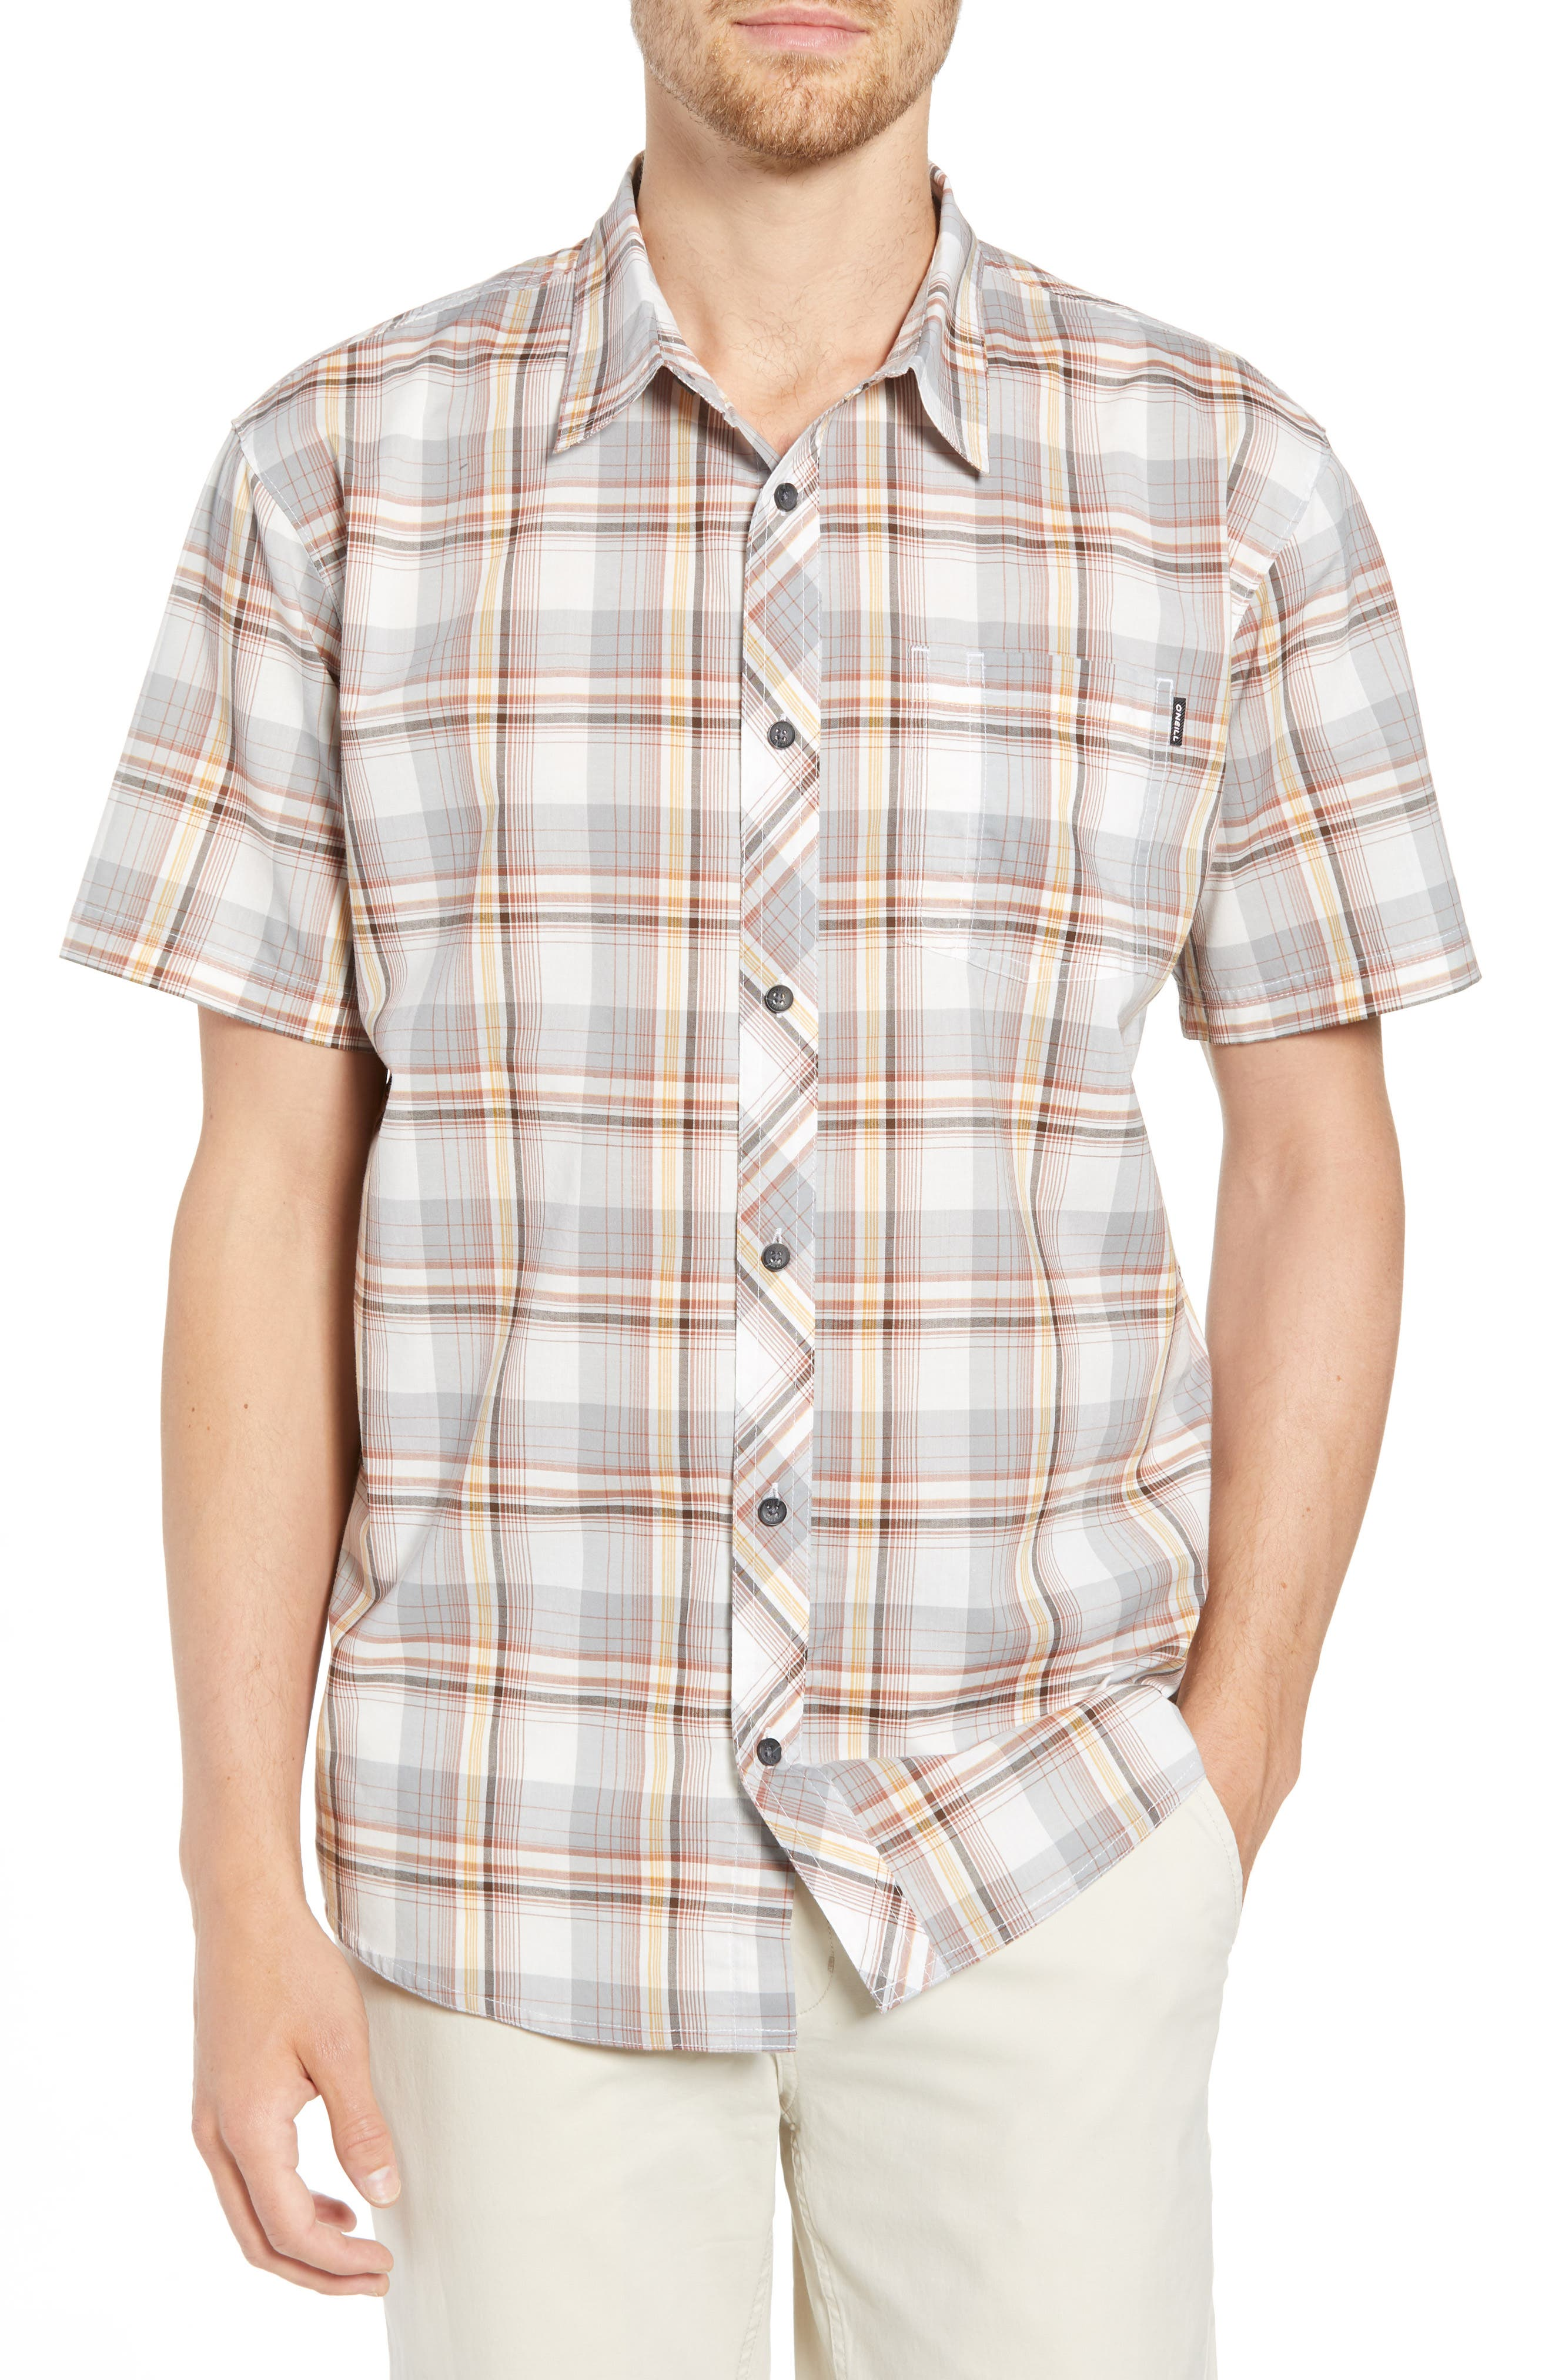 Gentry Short Sleeve Shirt,                             Main thumbnail 1, color,                             White